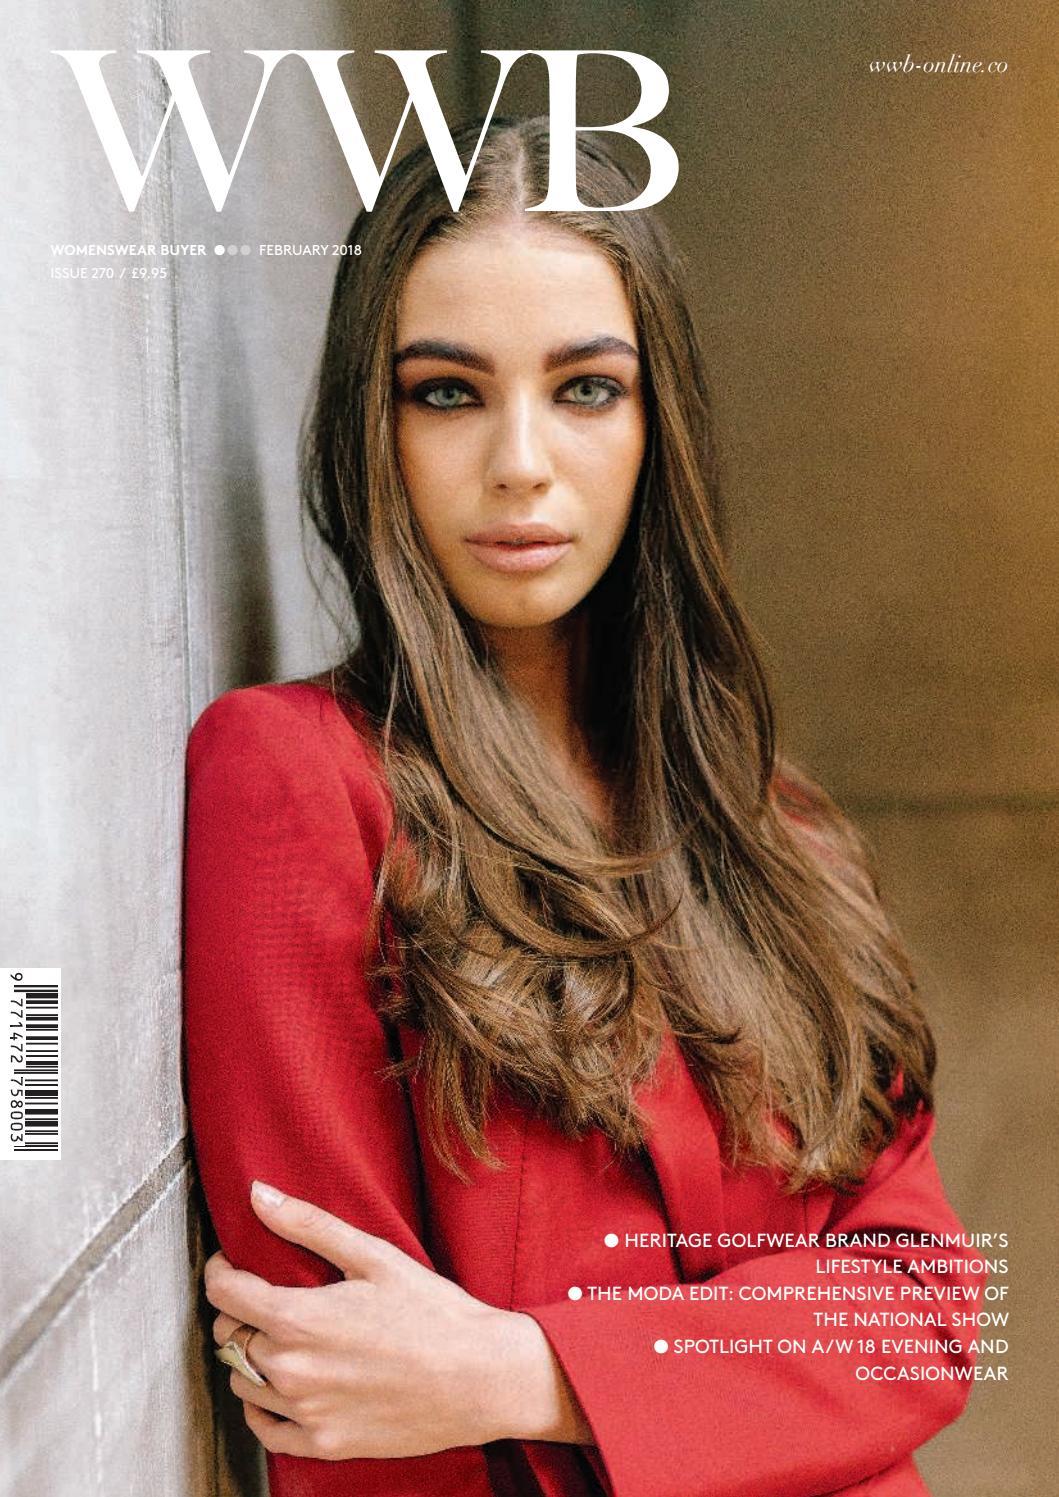 01bf2e125b1e WWB MAGAZINE FEBRUARY 2018 ISSUE 270 by fashion buyers Ltd - issuu